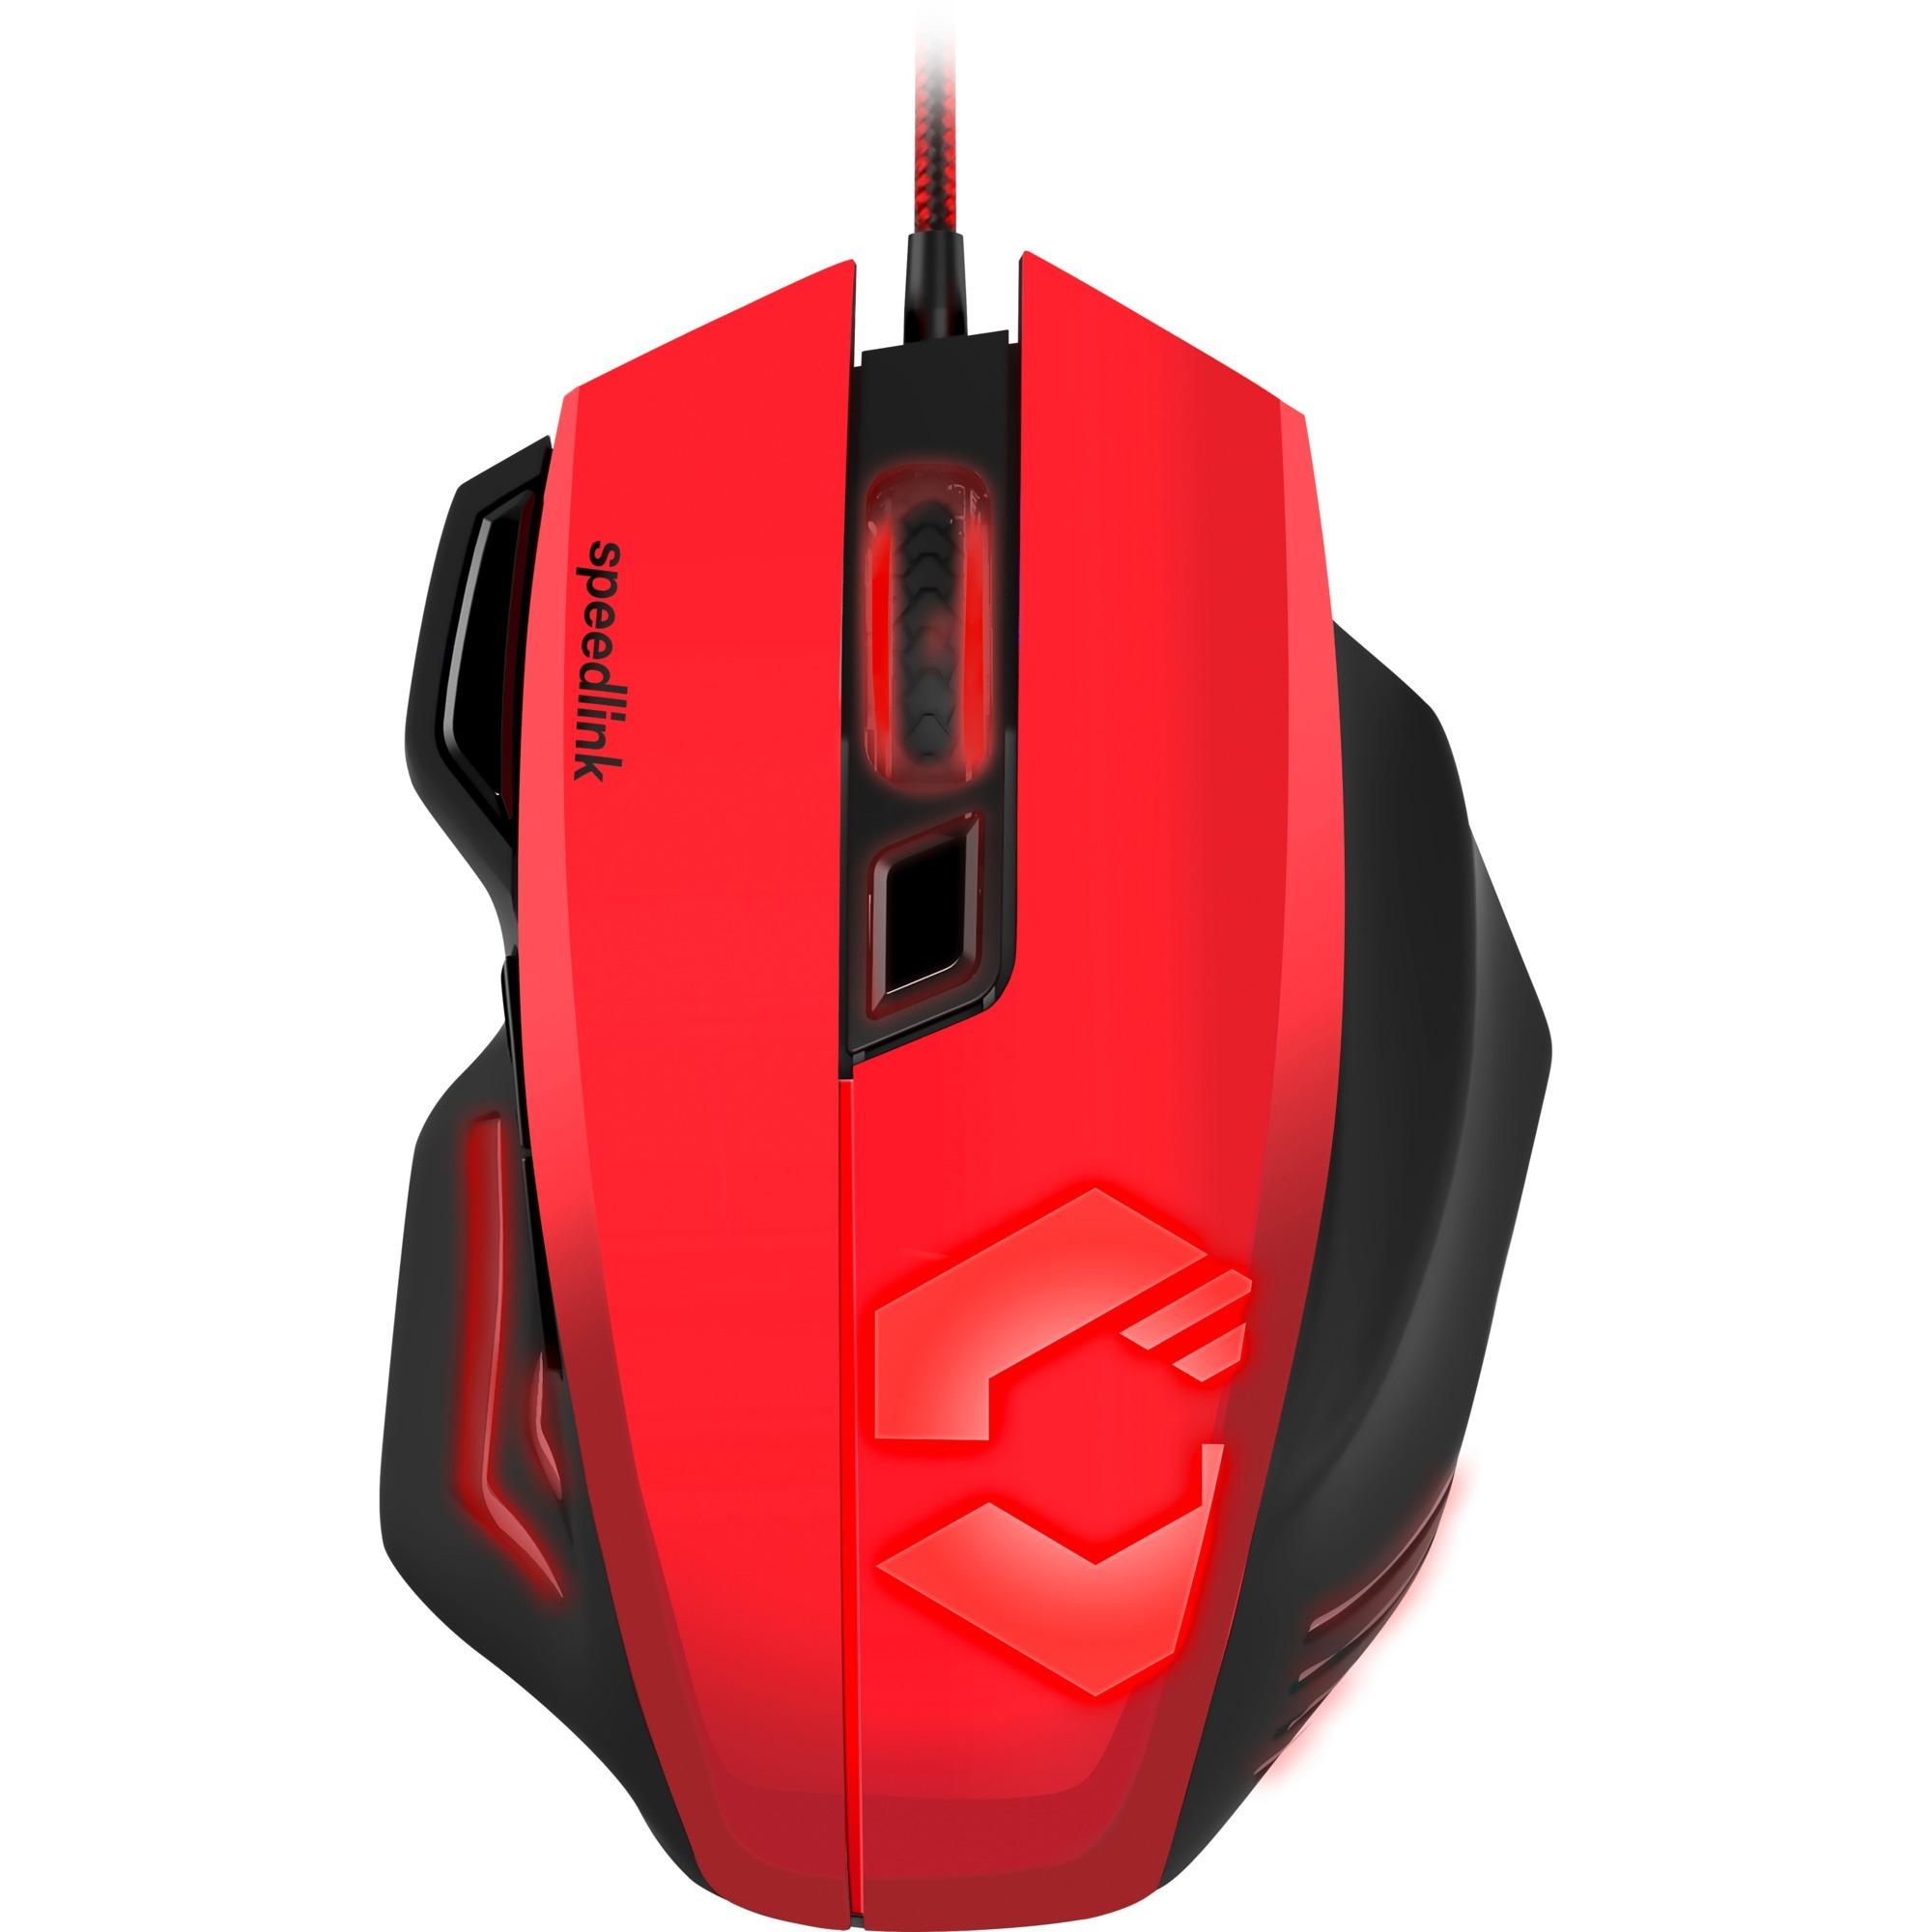 Decus Respec ratón USB Óptico 5000 DPI mano derecha Negro, Rojo